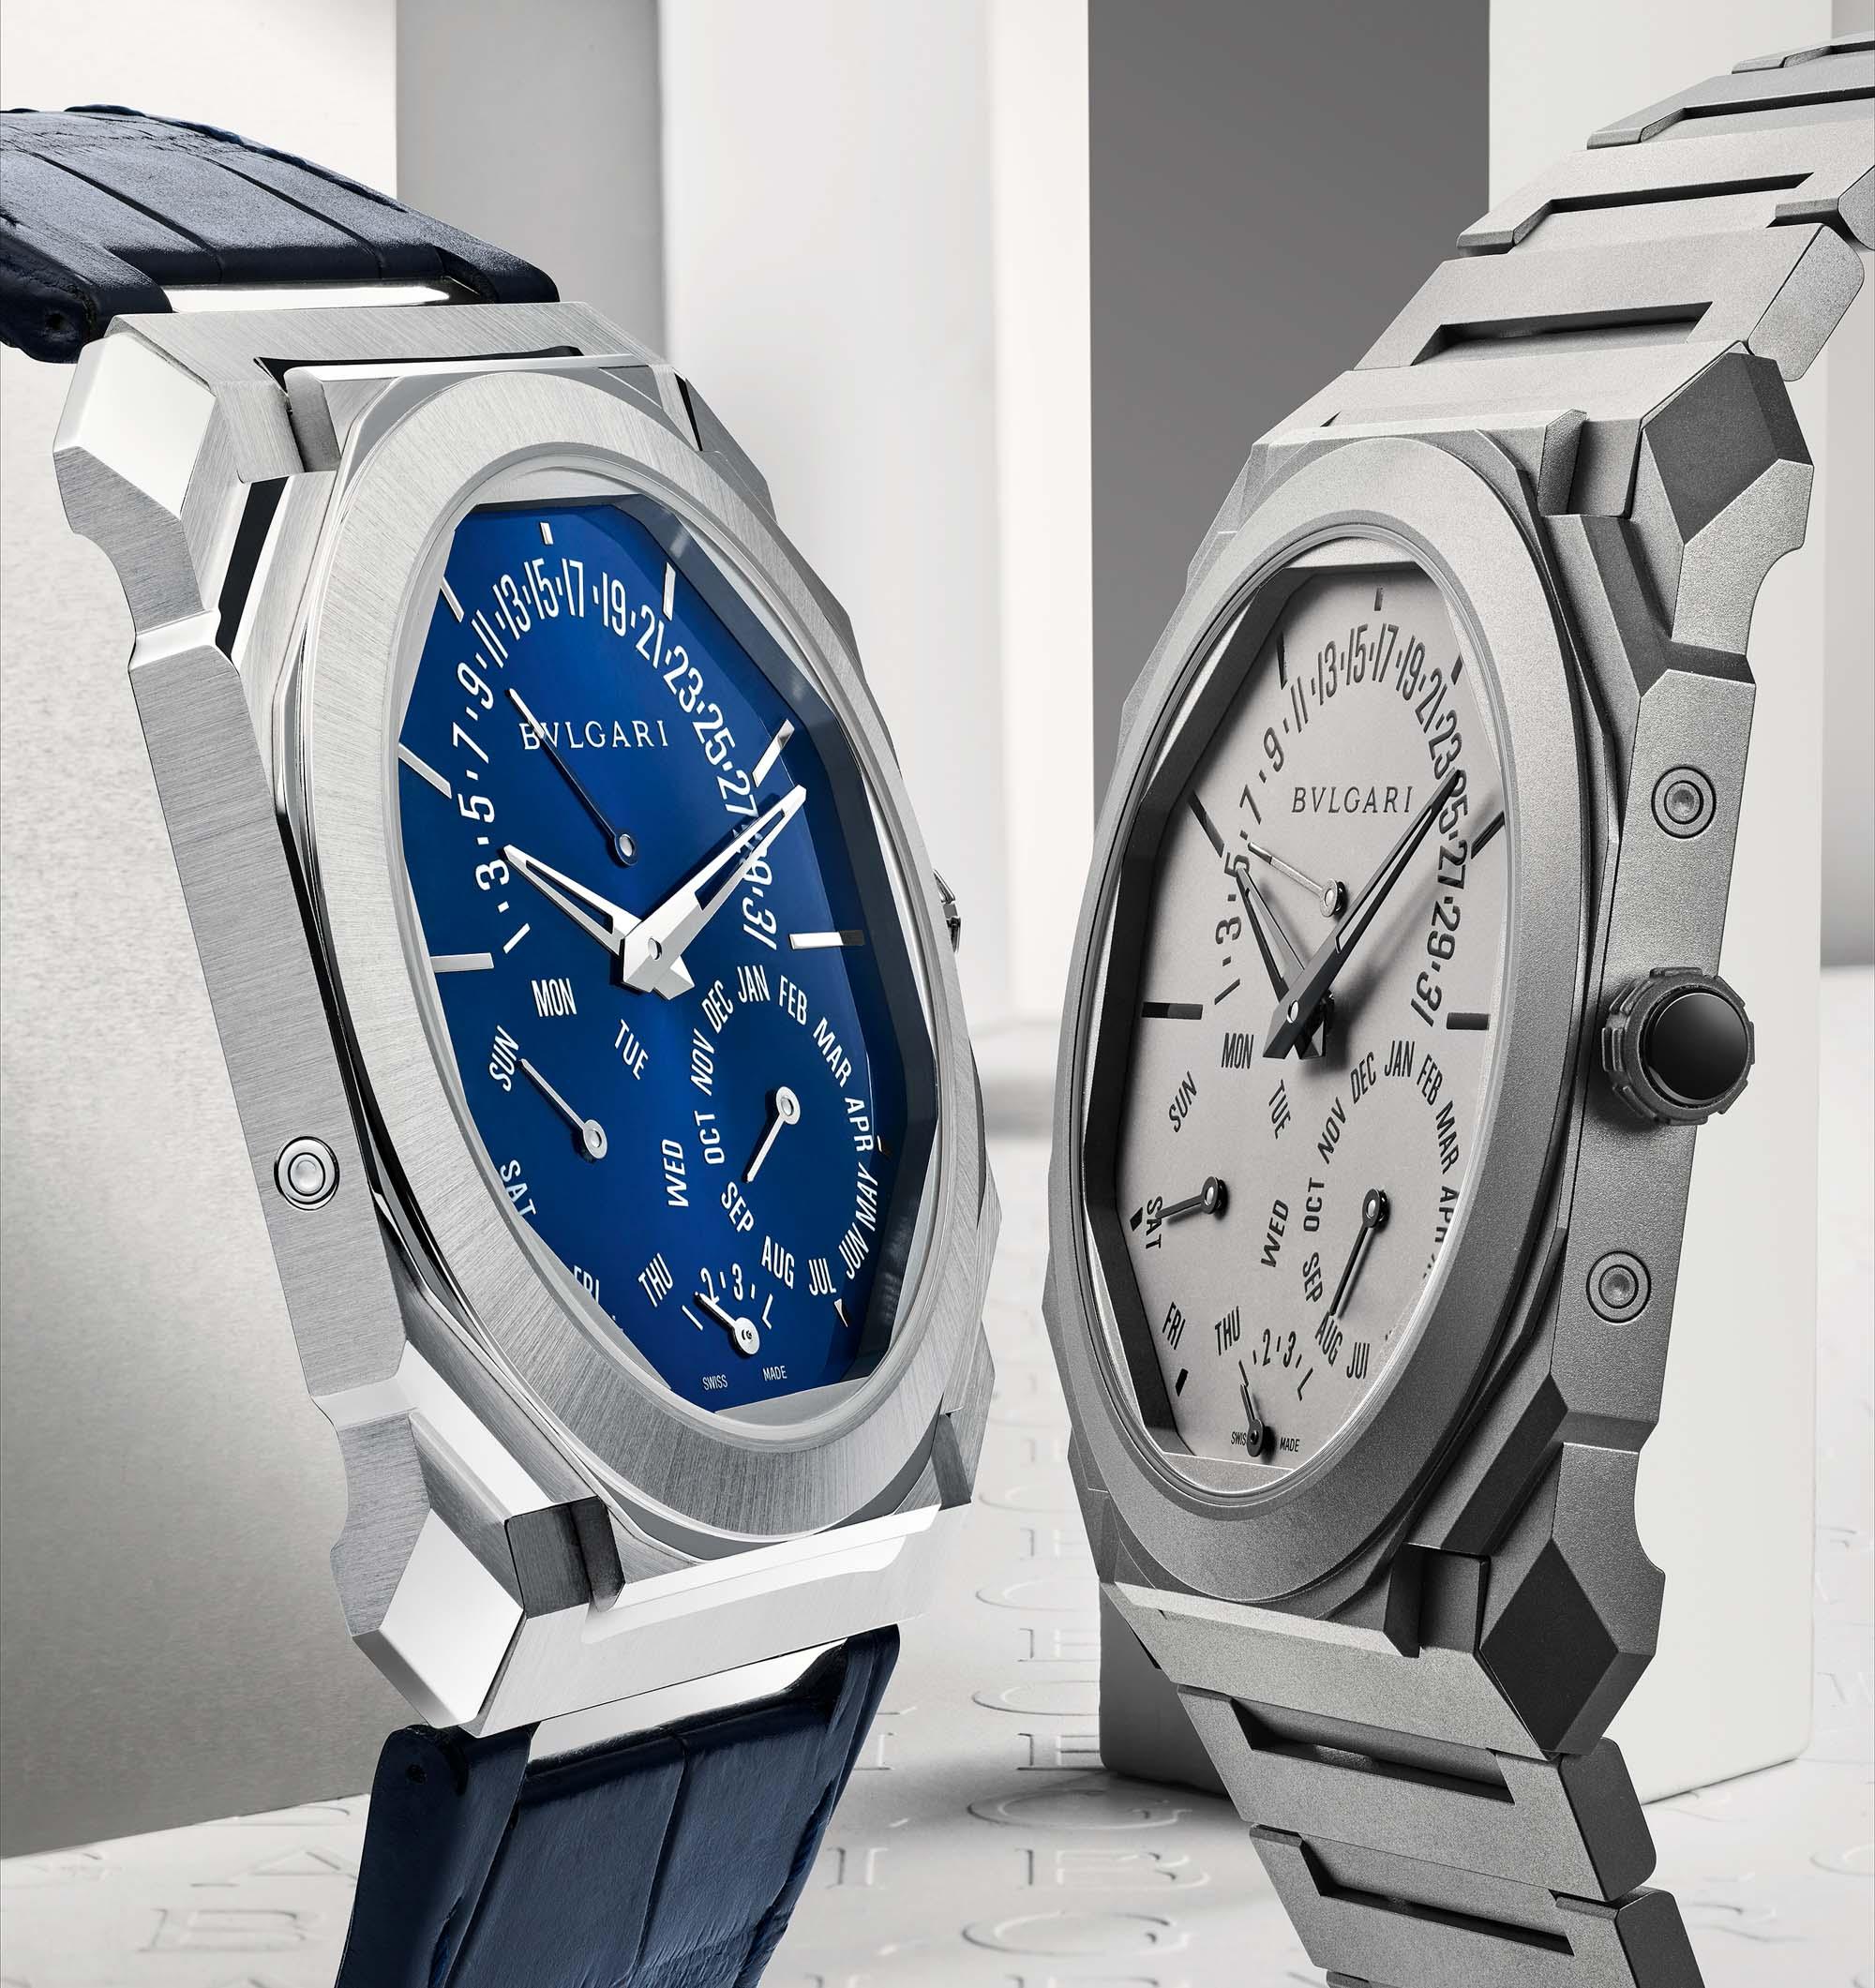 Bulgari Octo Finissimo Perpetual Calendar Watch–Ultra Thin World Record Dress Watch 2021 34